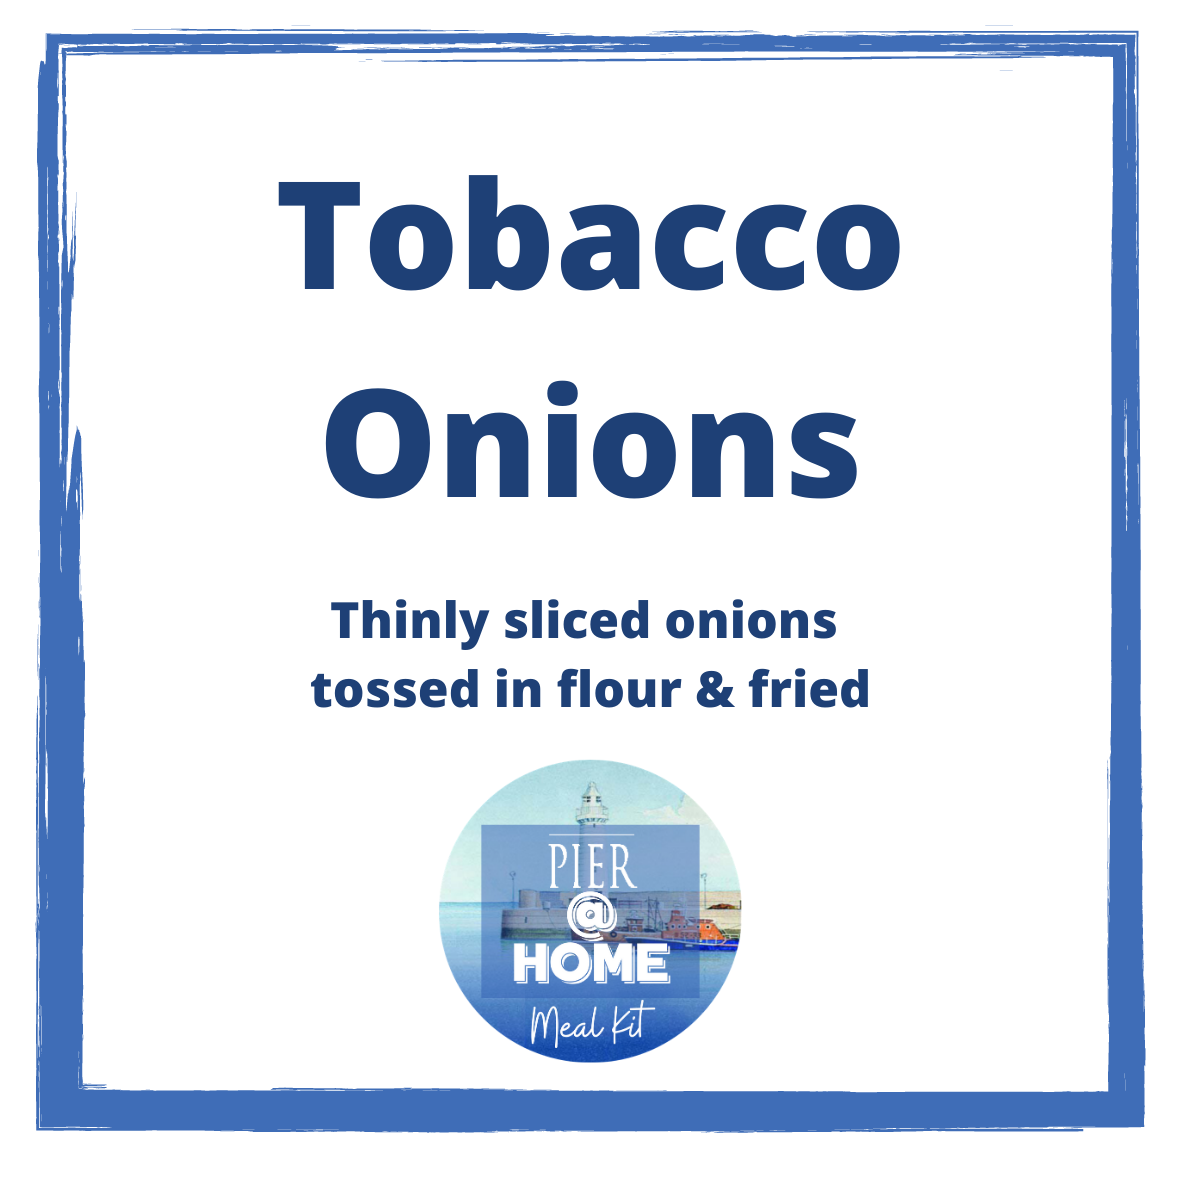 SIDE DISH Tobacco onions